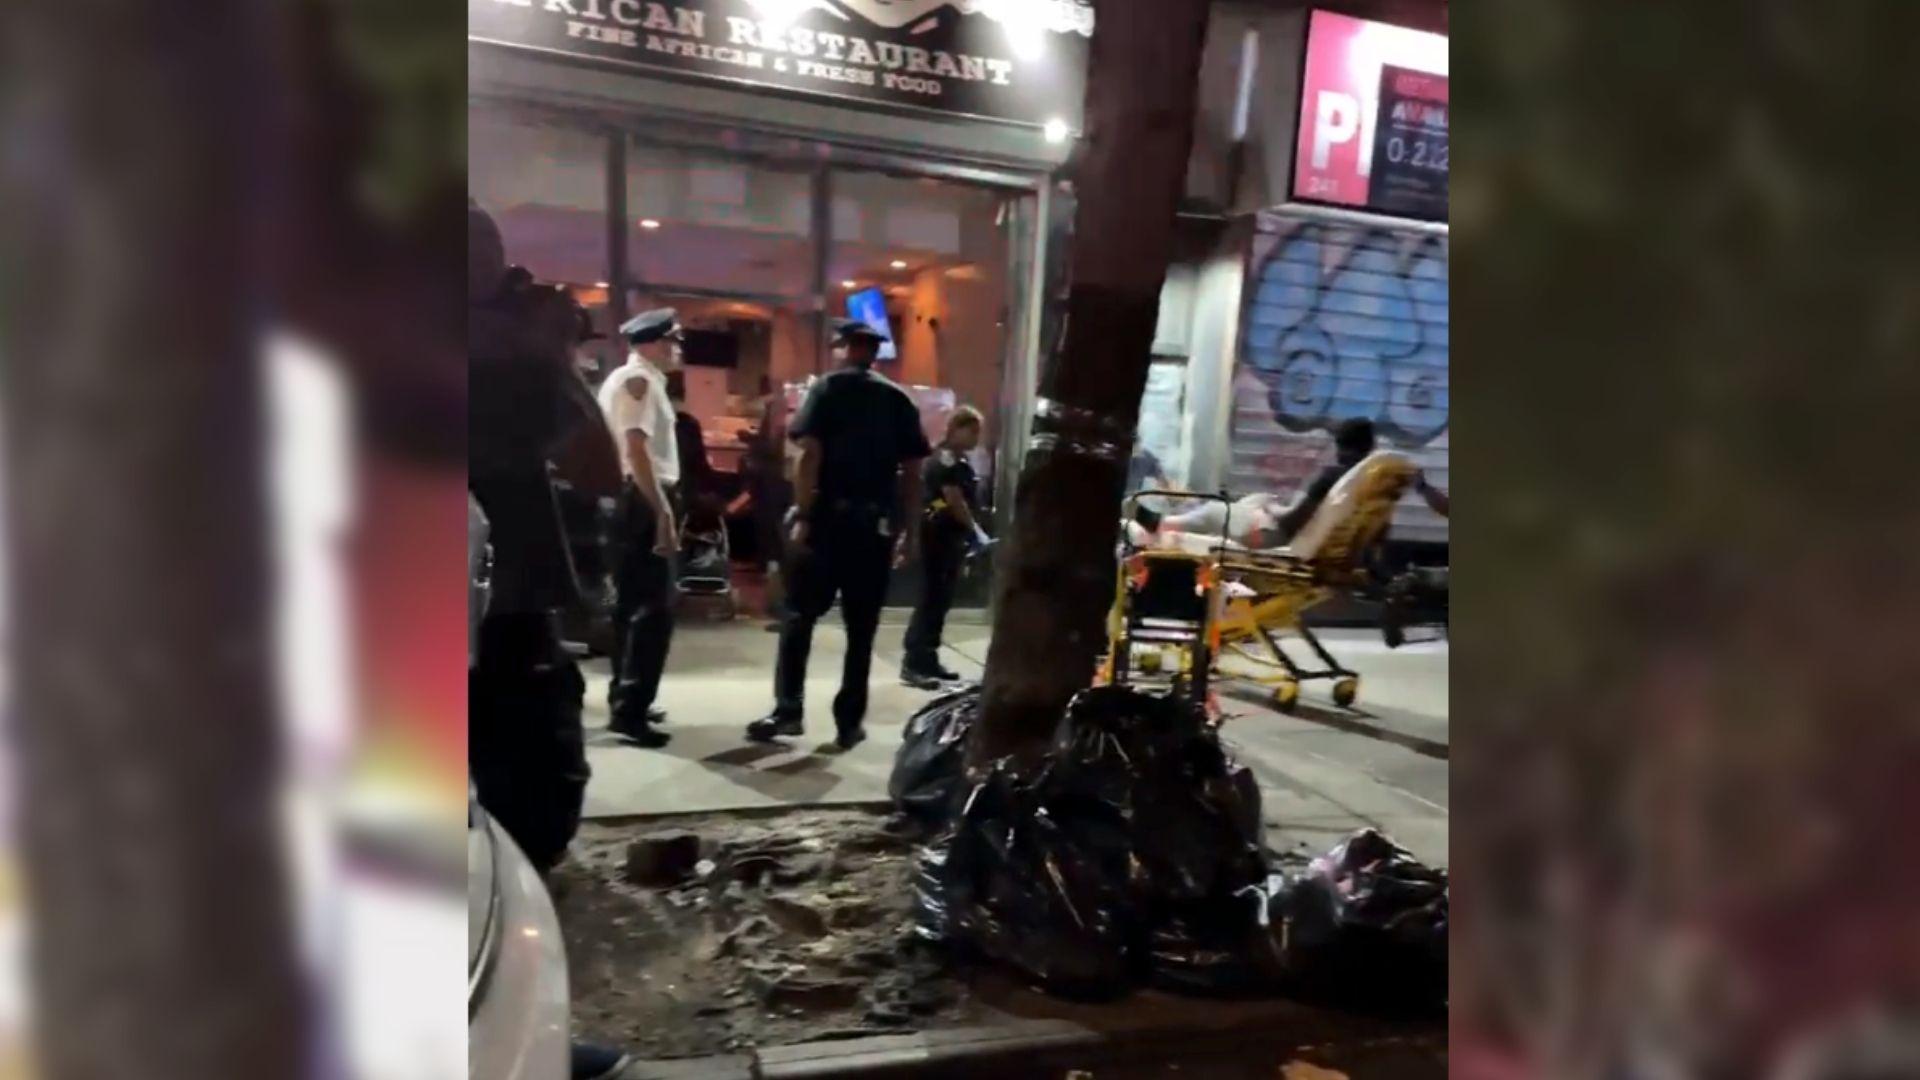 Teen shot in leg in Harlem